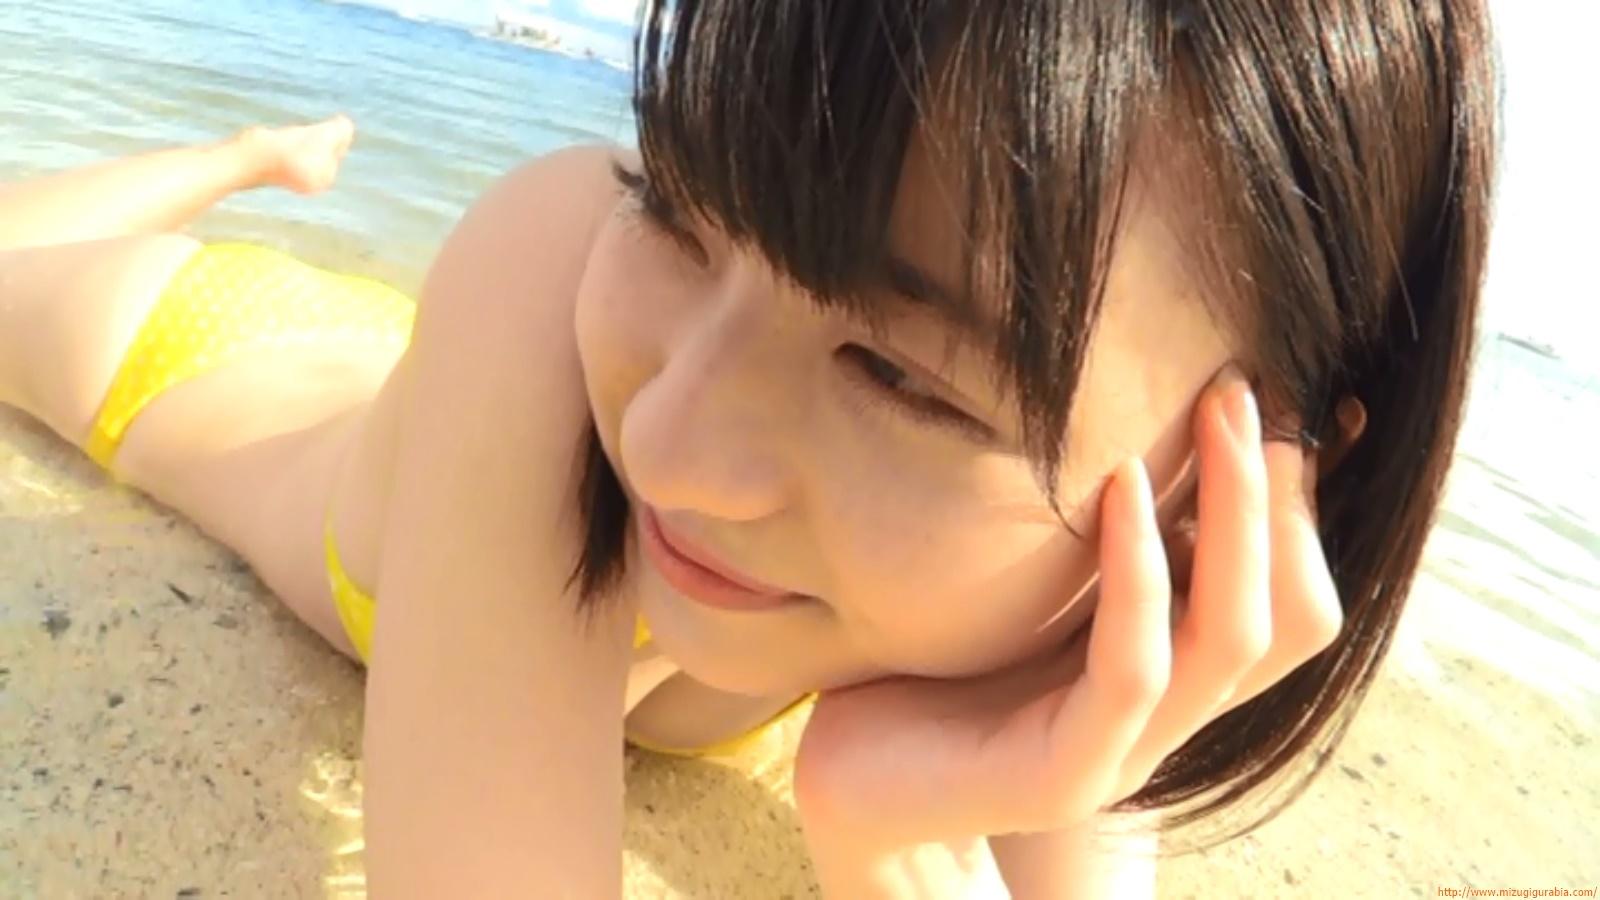 Beach dating376